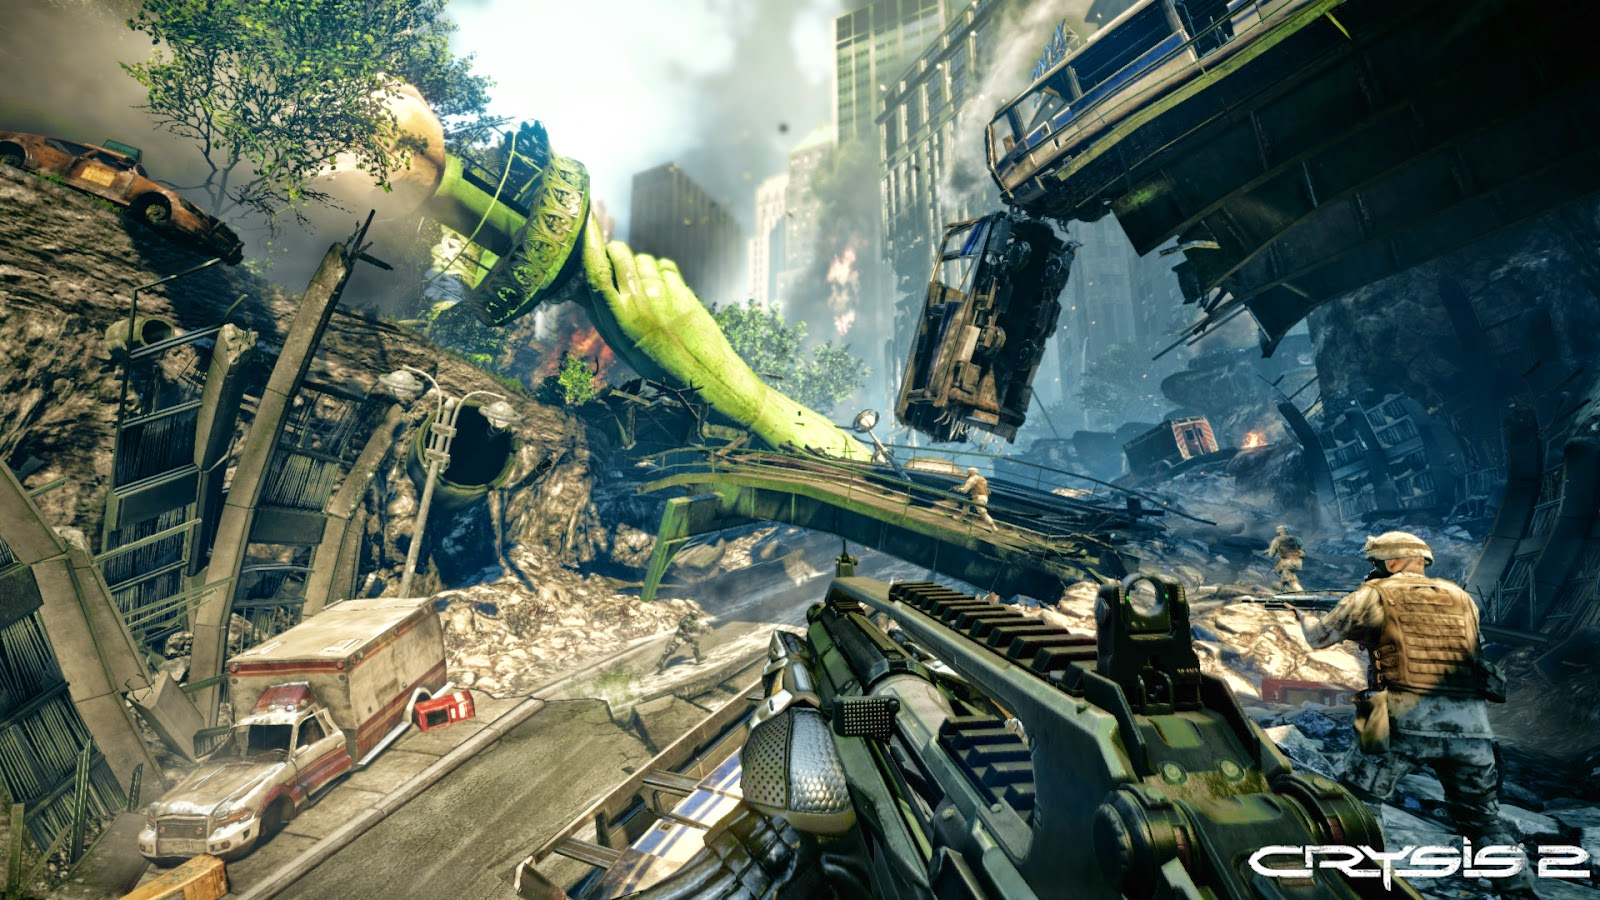 Crysis 2 For PC Full Version Single Link Terbaru